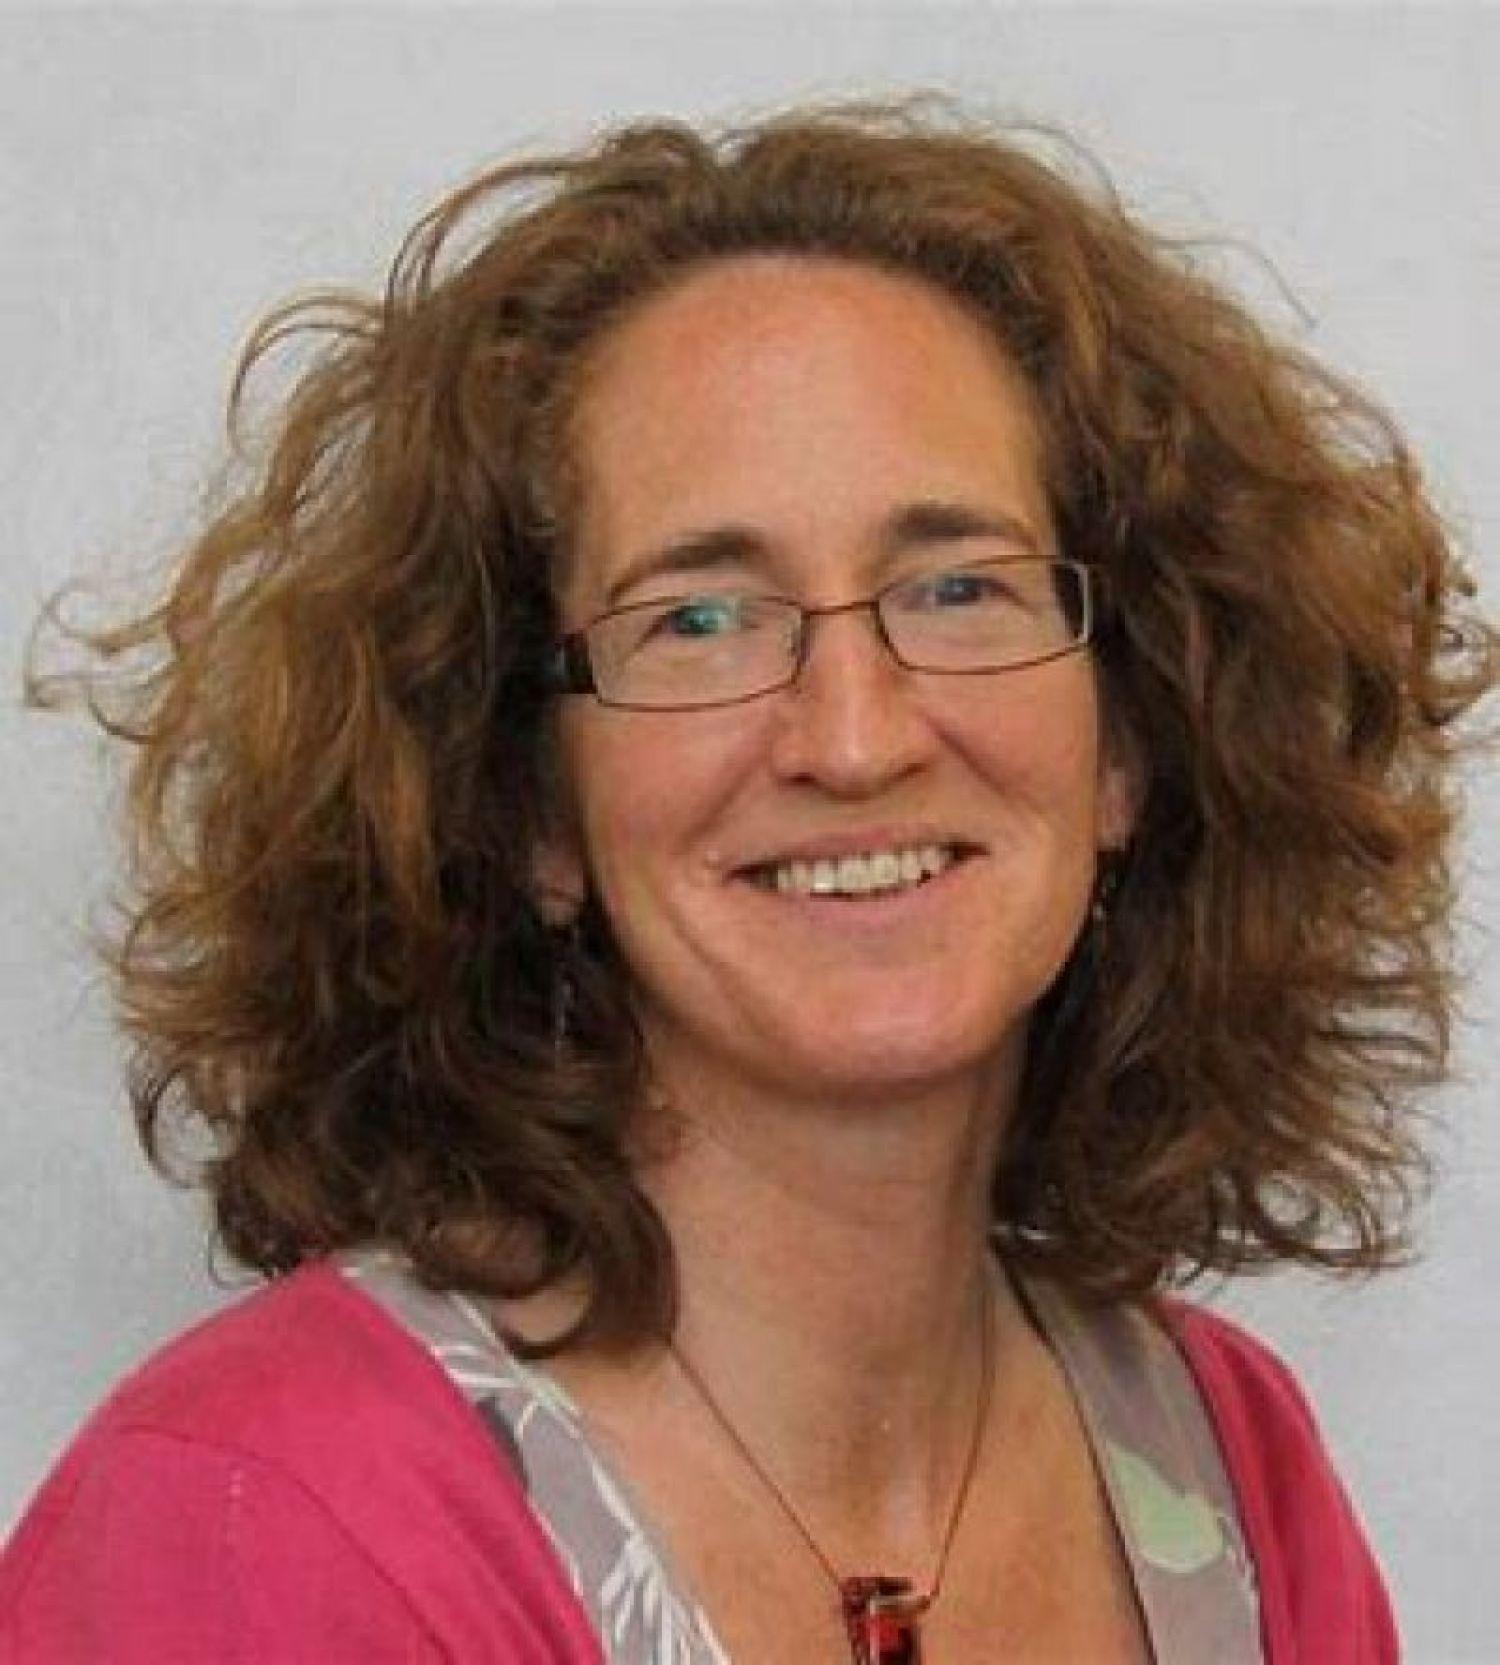 Spotlight on CCG Members - Jane Anthony - May 2021